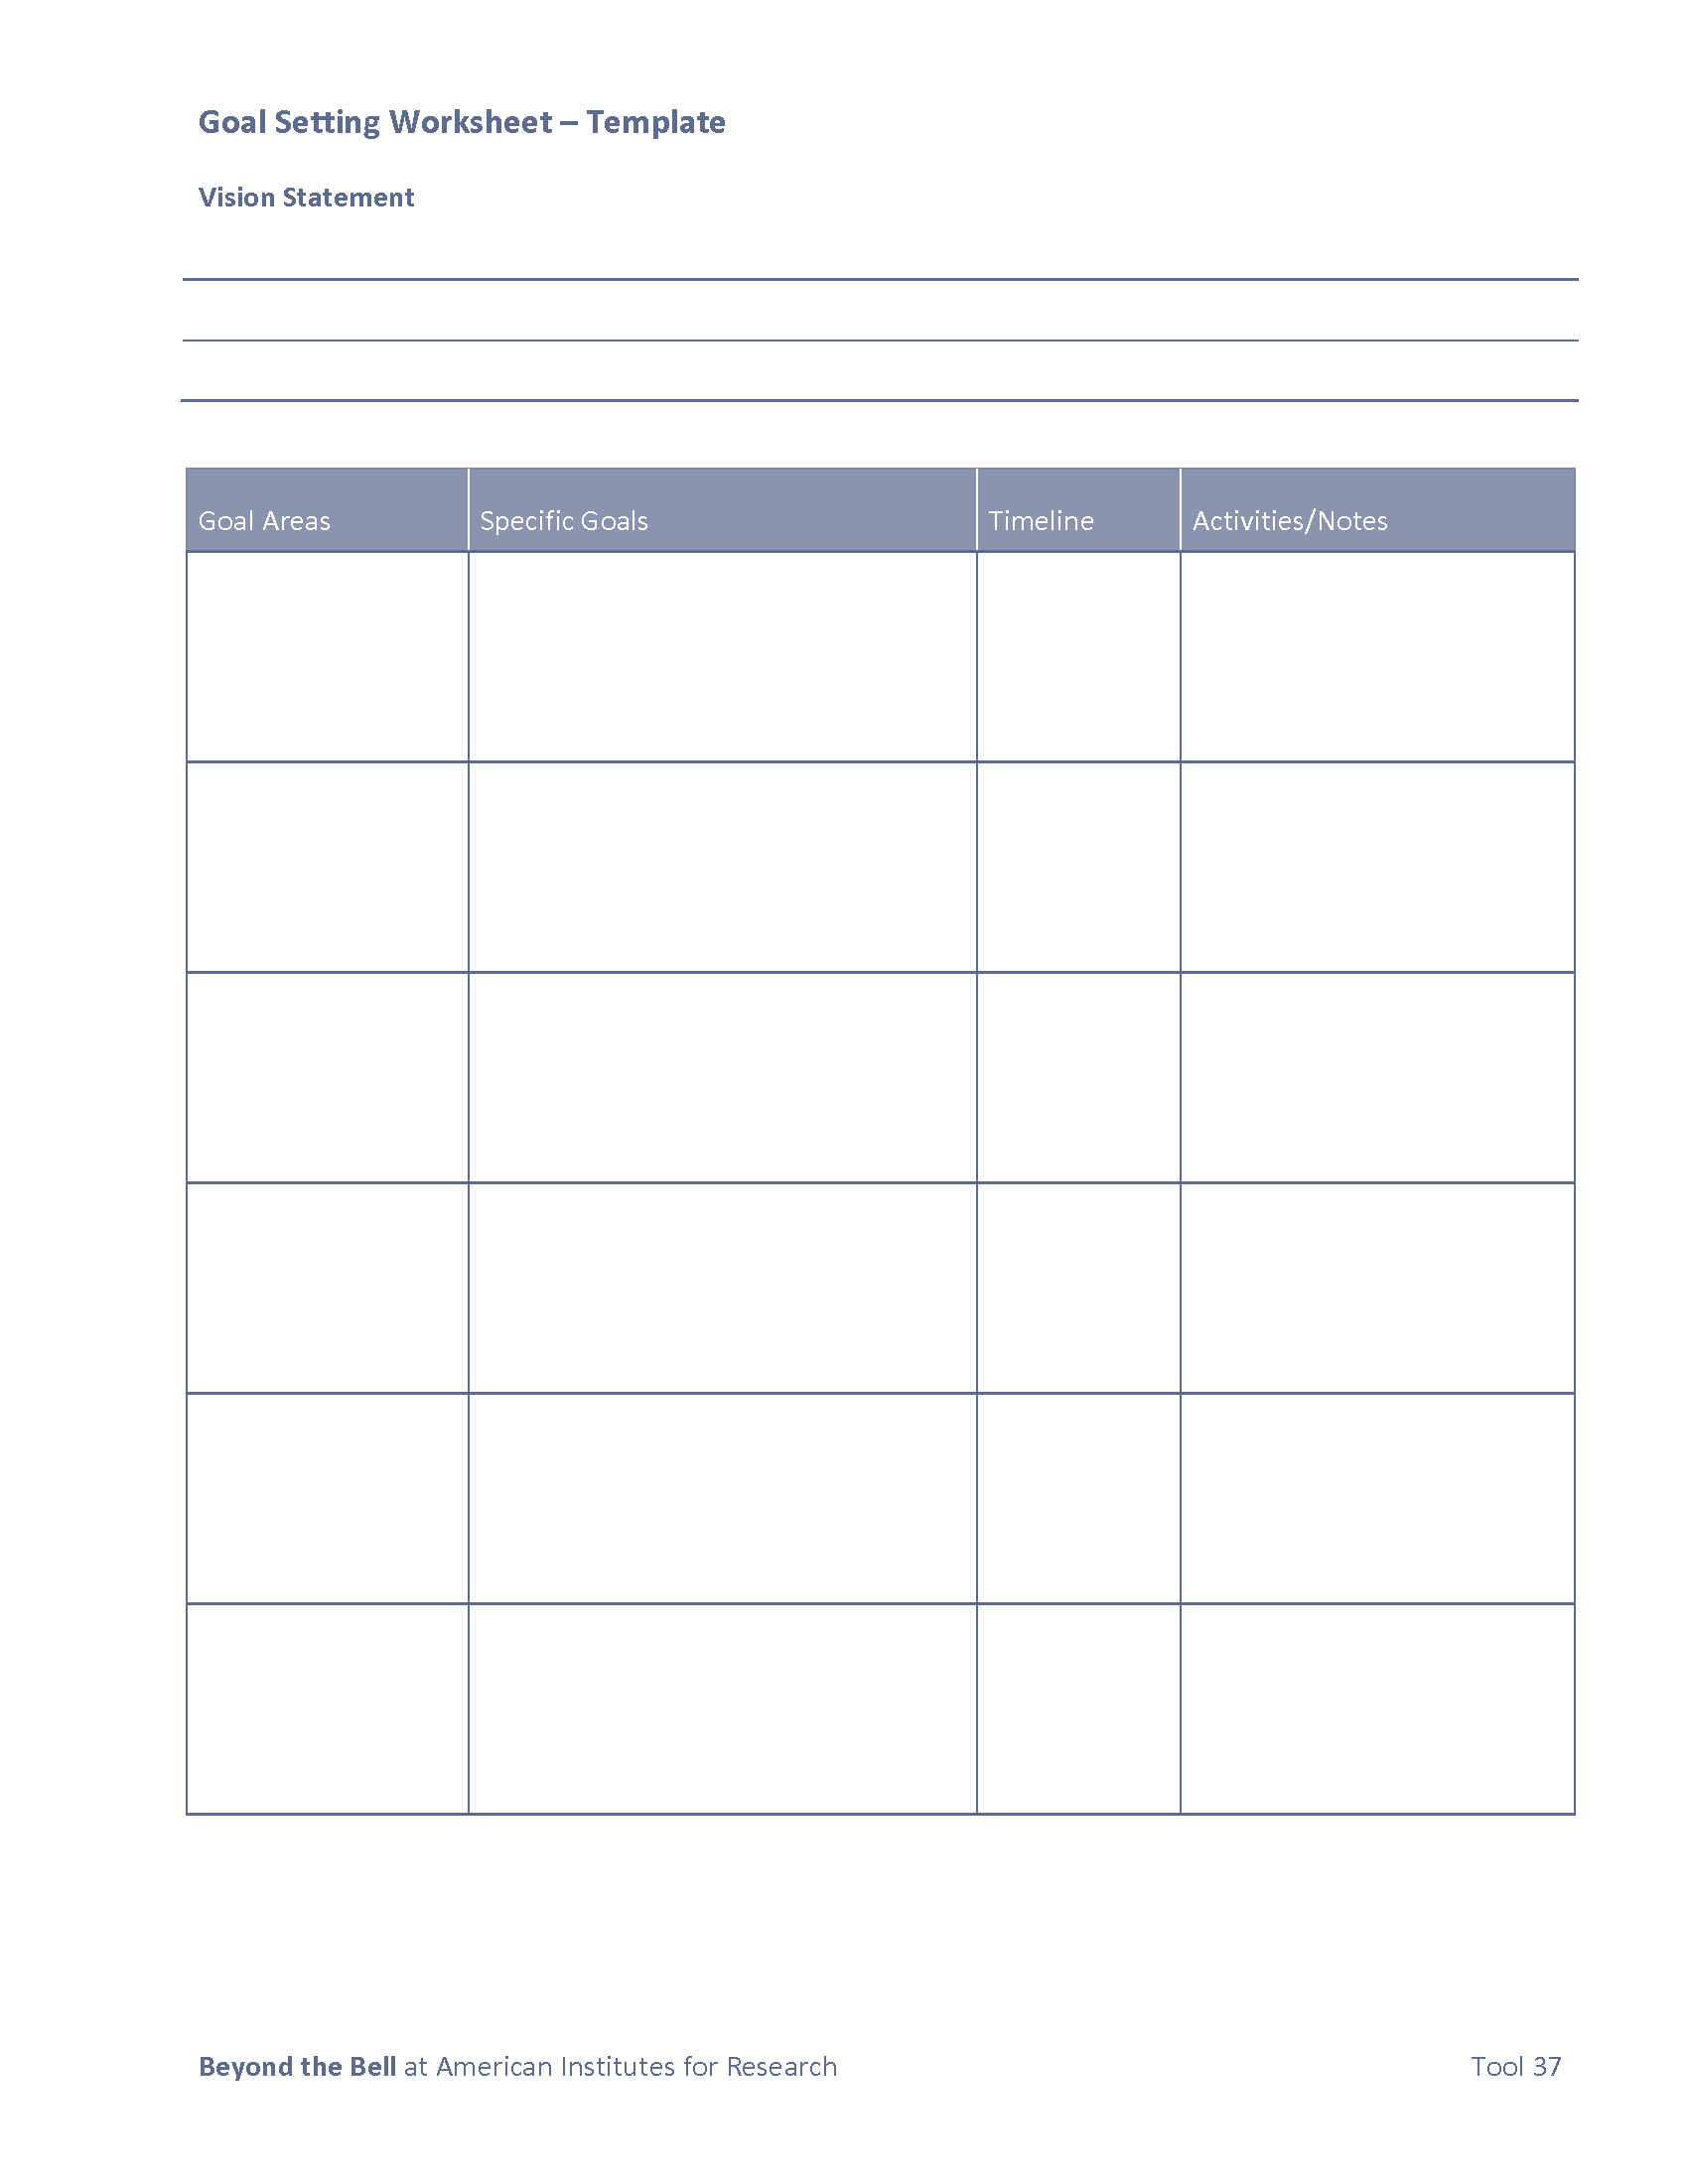 Beyond the Bell | Tool 37 - Goal Setting Worksheet 2